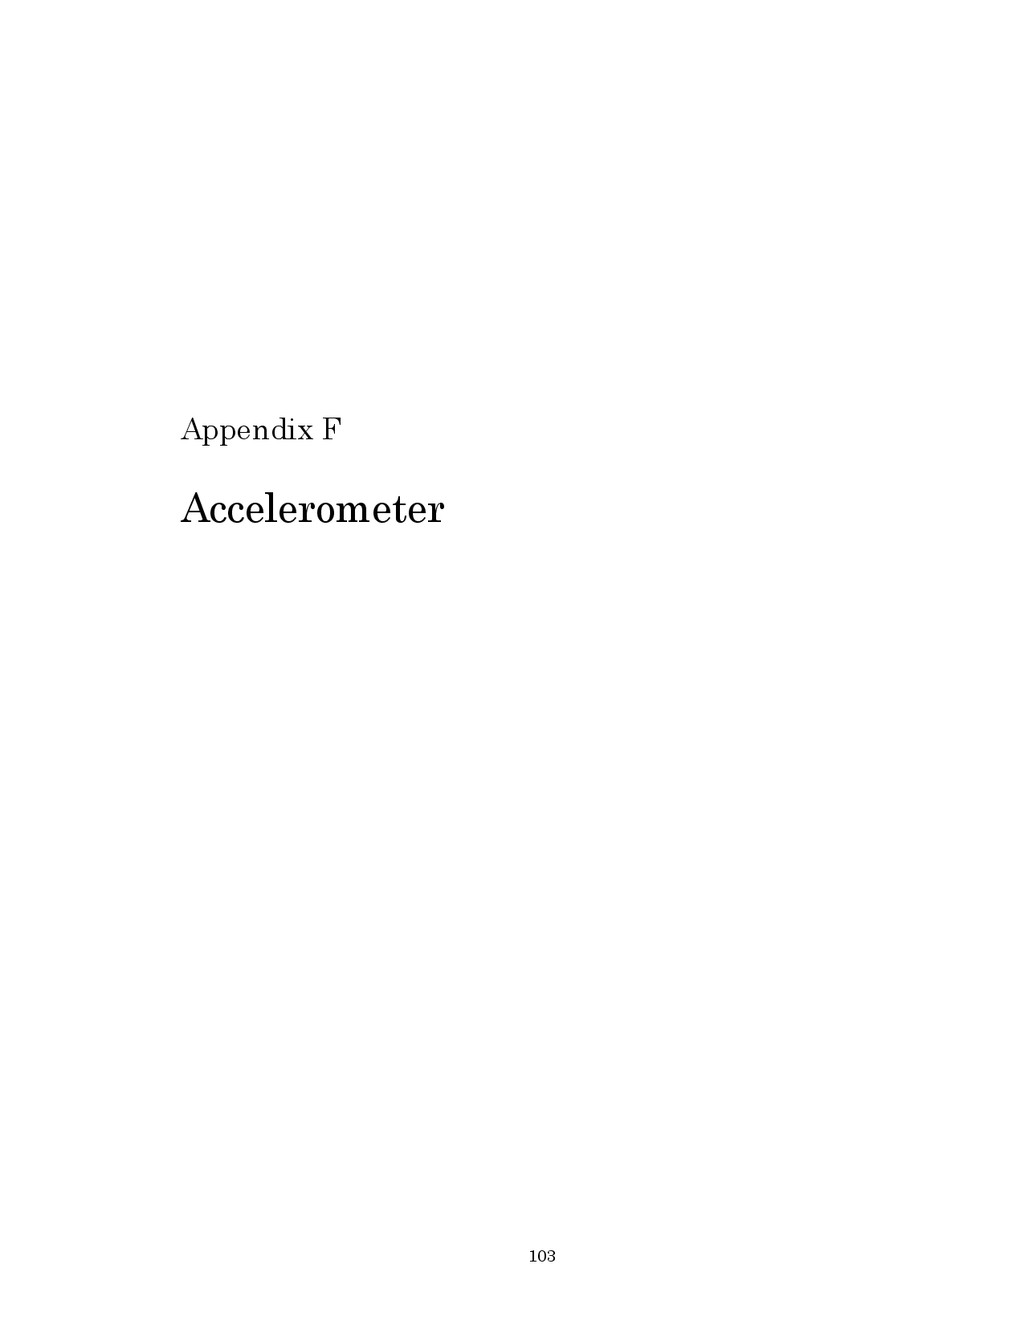 103 Appendix F Accelerometer